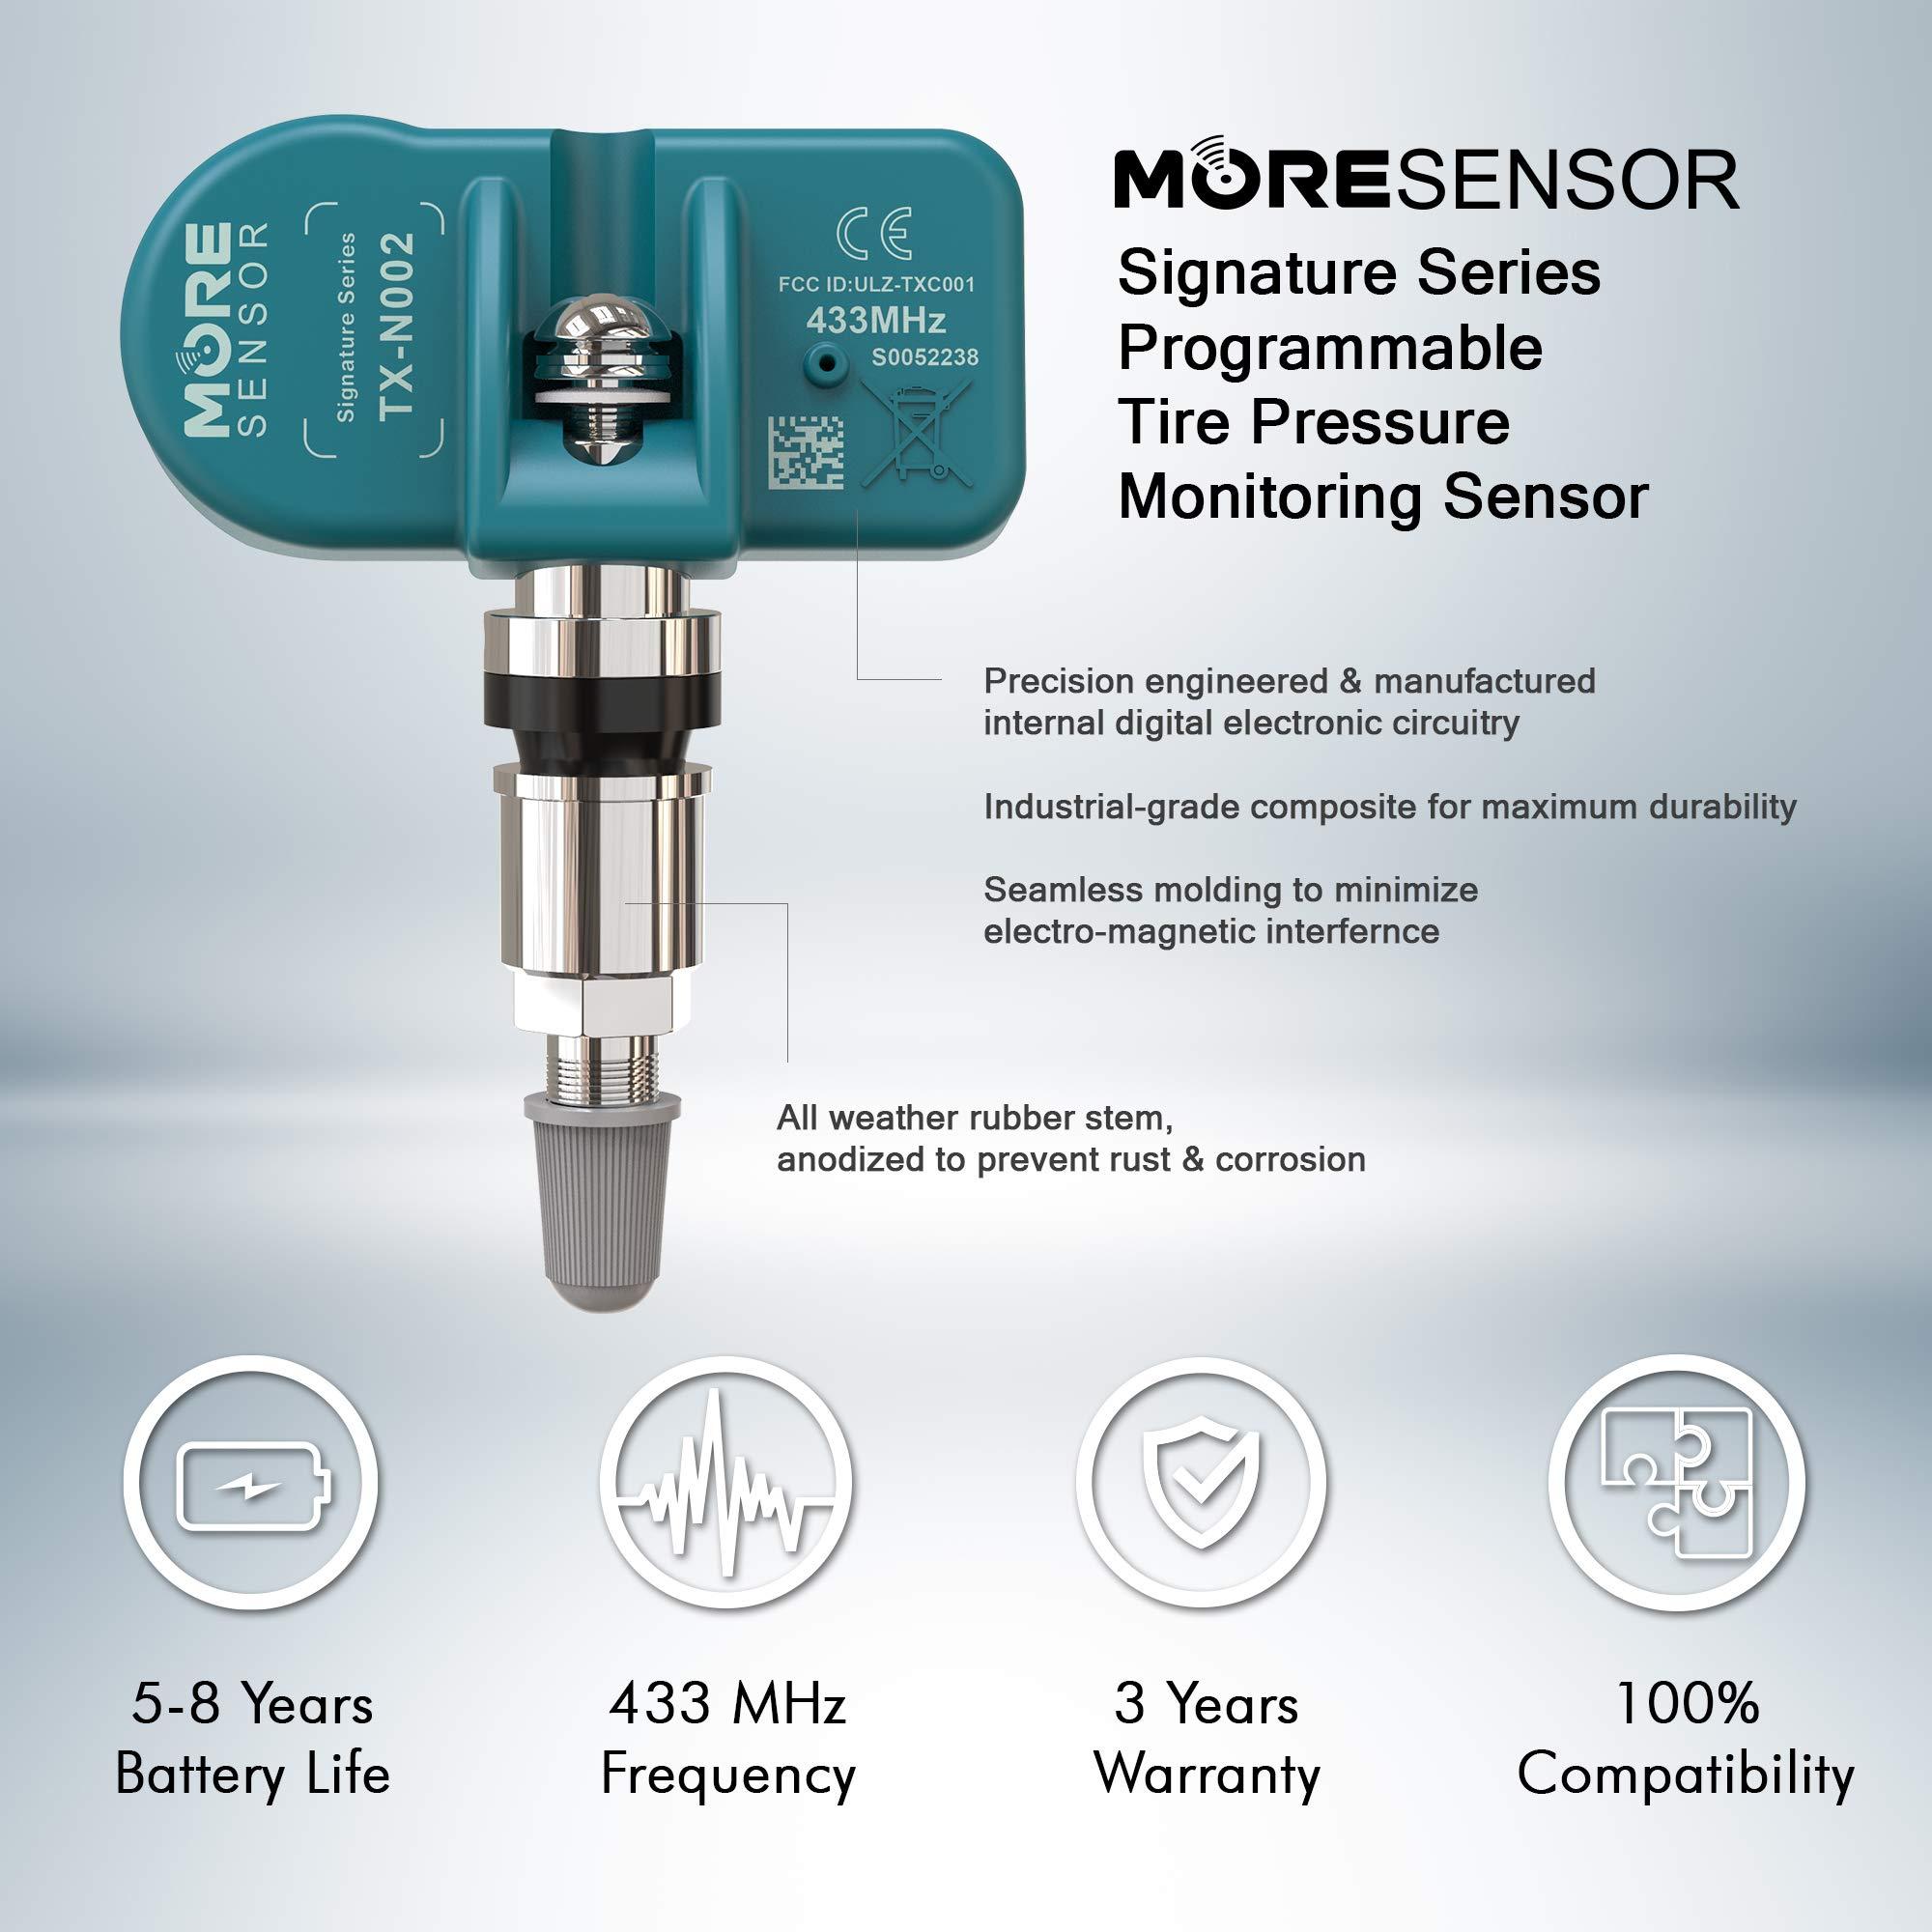 TX-S045 433 MHz MOBILETRON DuroSense MORE TPMS Sensor Clamp-in Tyre pressure monitoring sensor